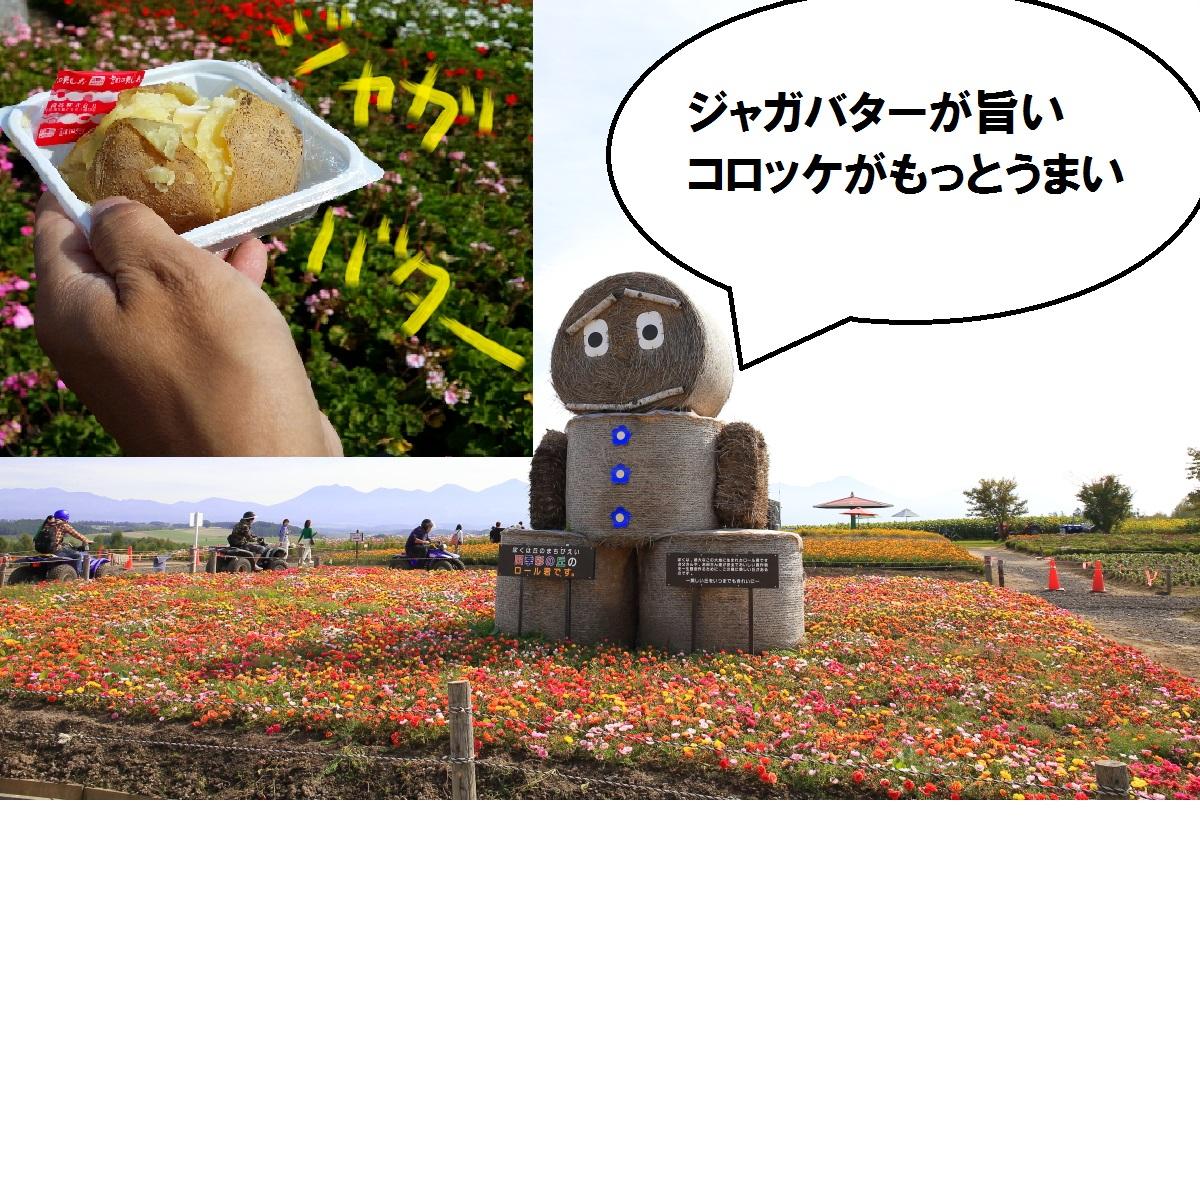 3_20141013221036a79.jpg